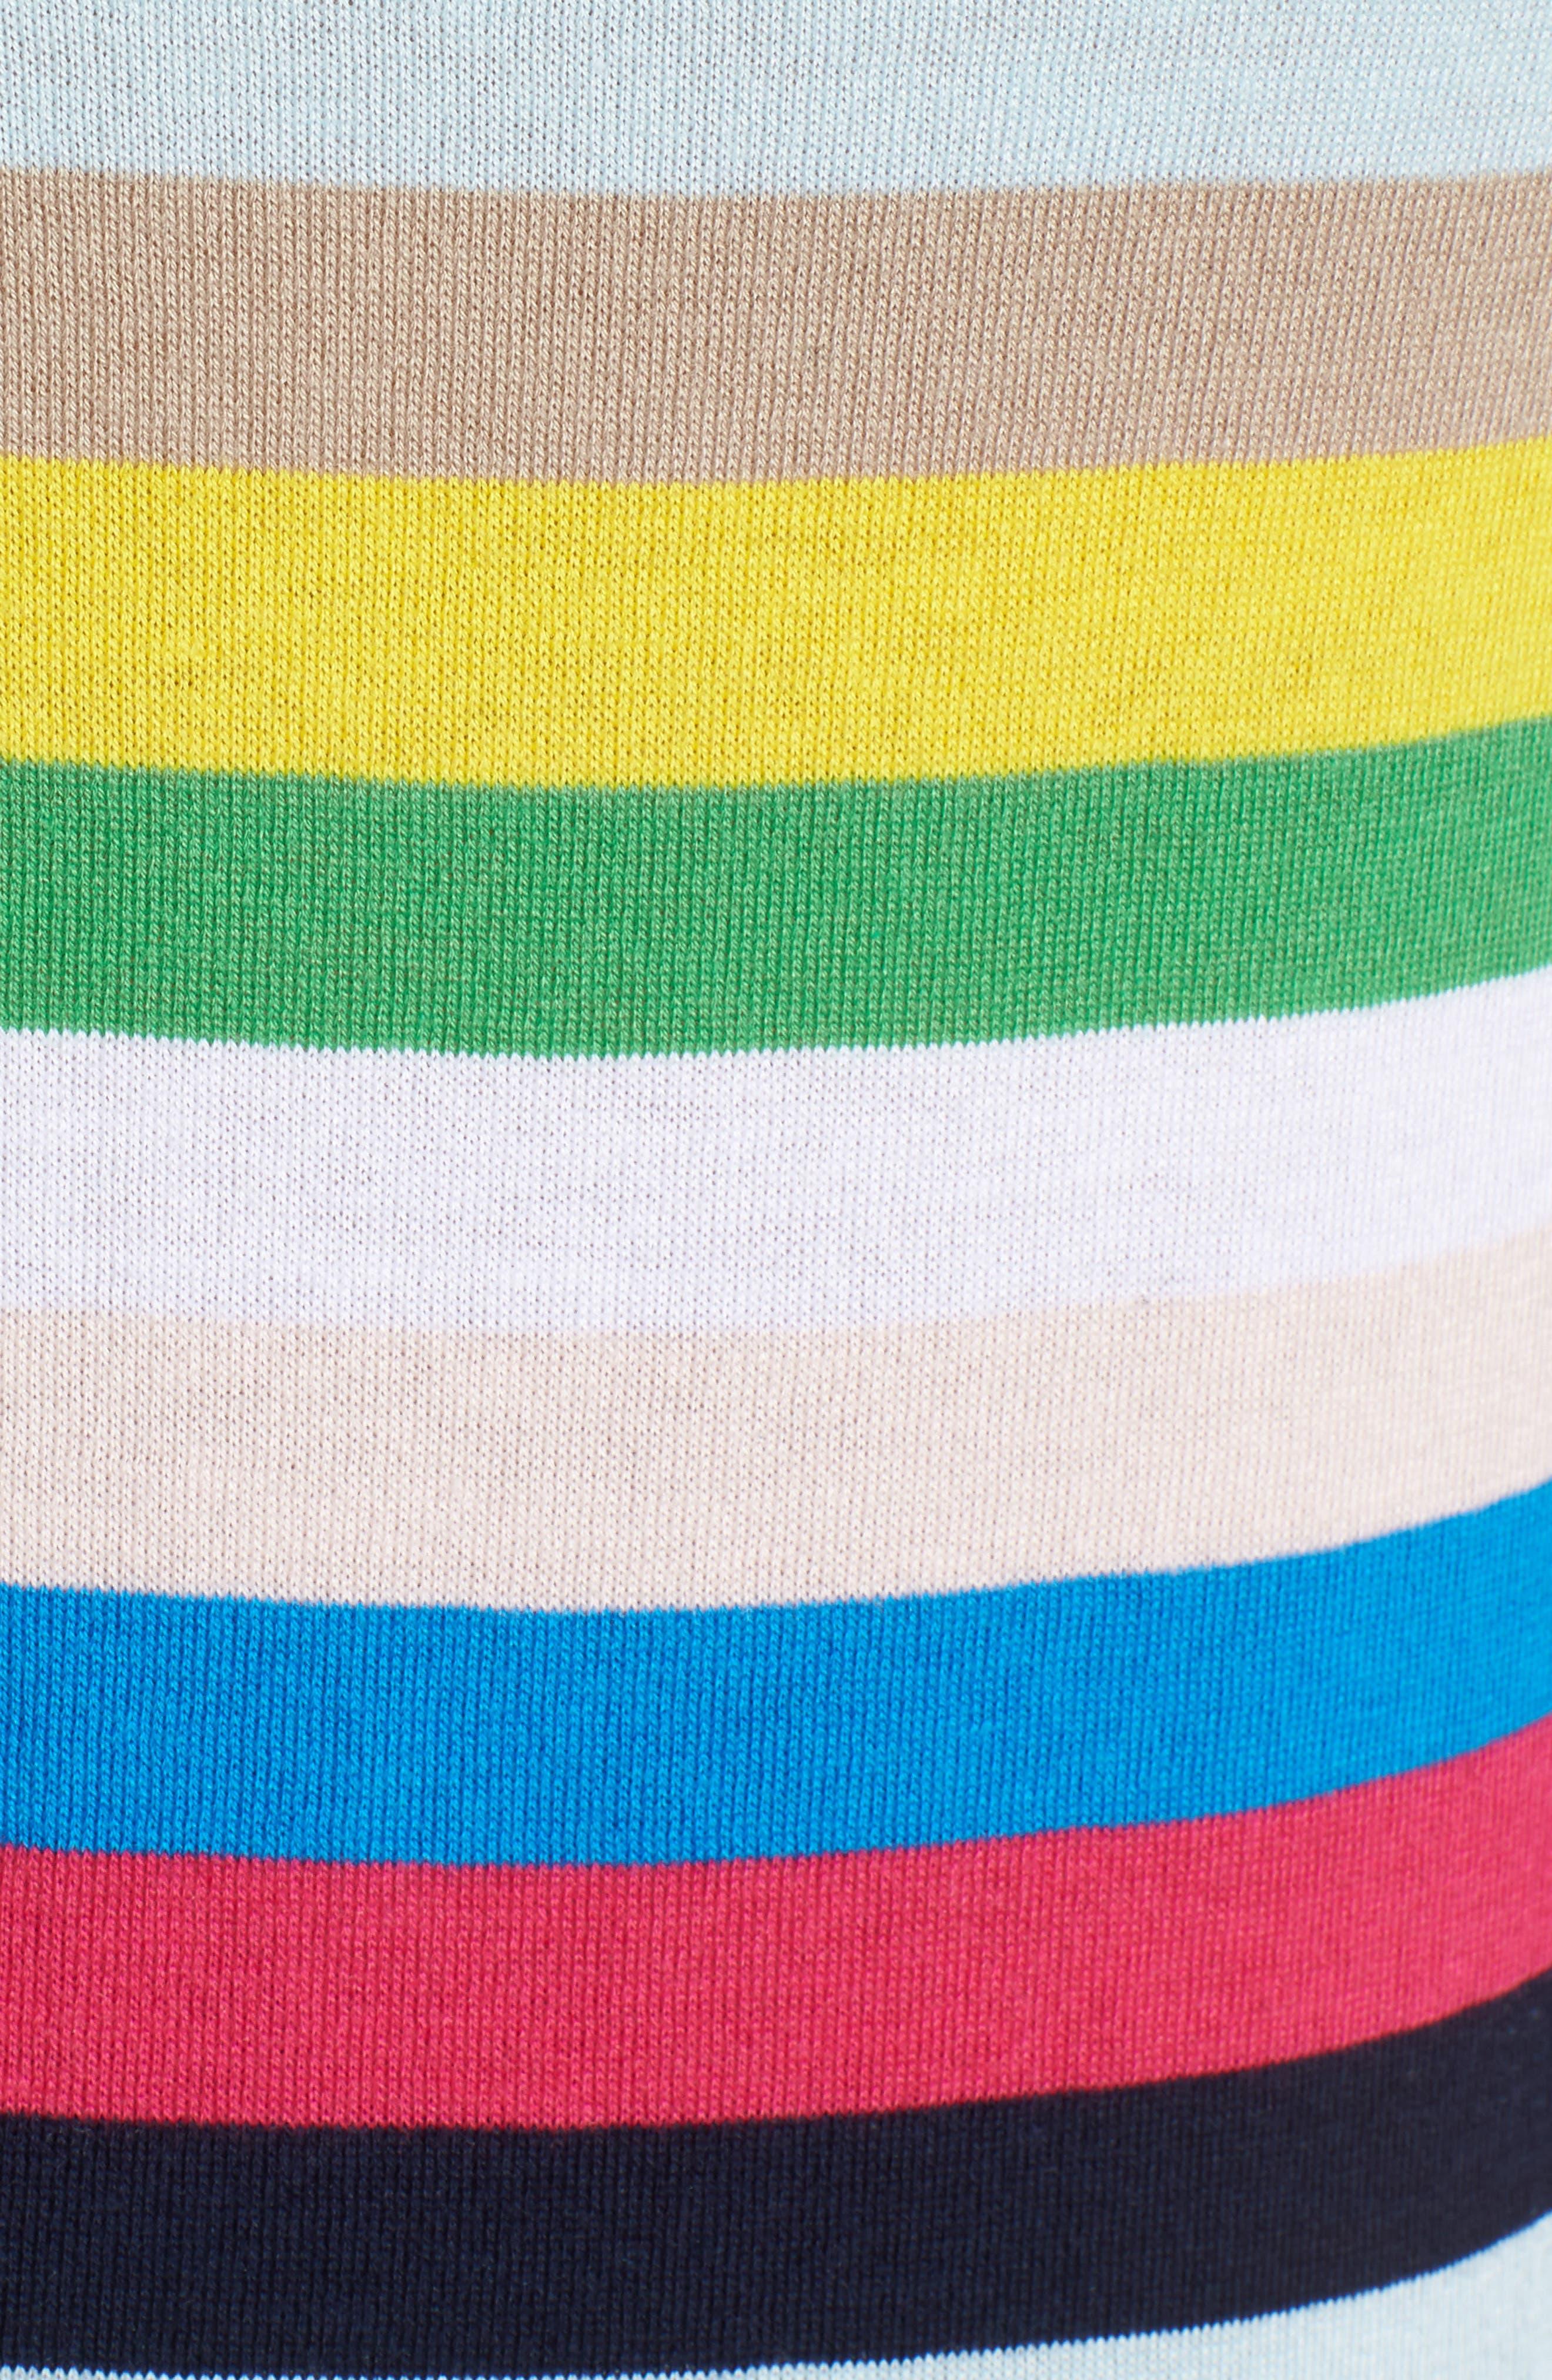 Crewneck Sweater,                             Alternate thumbnail 47, color,